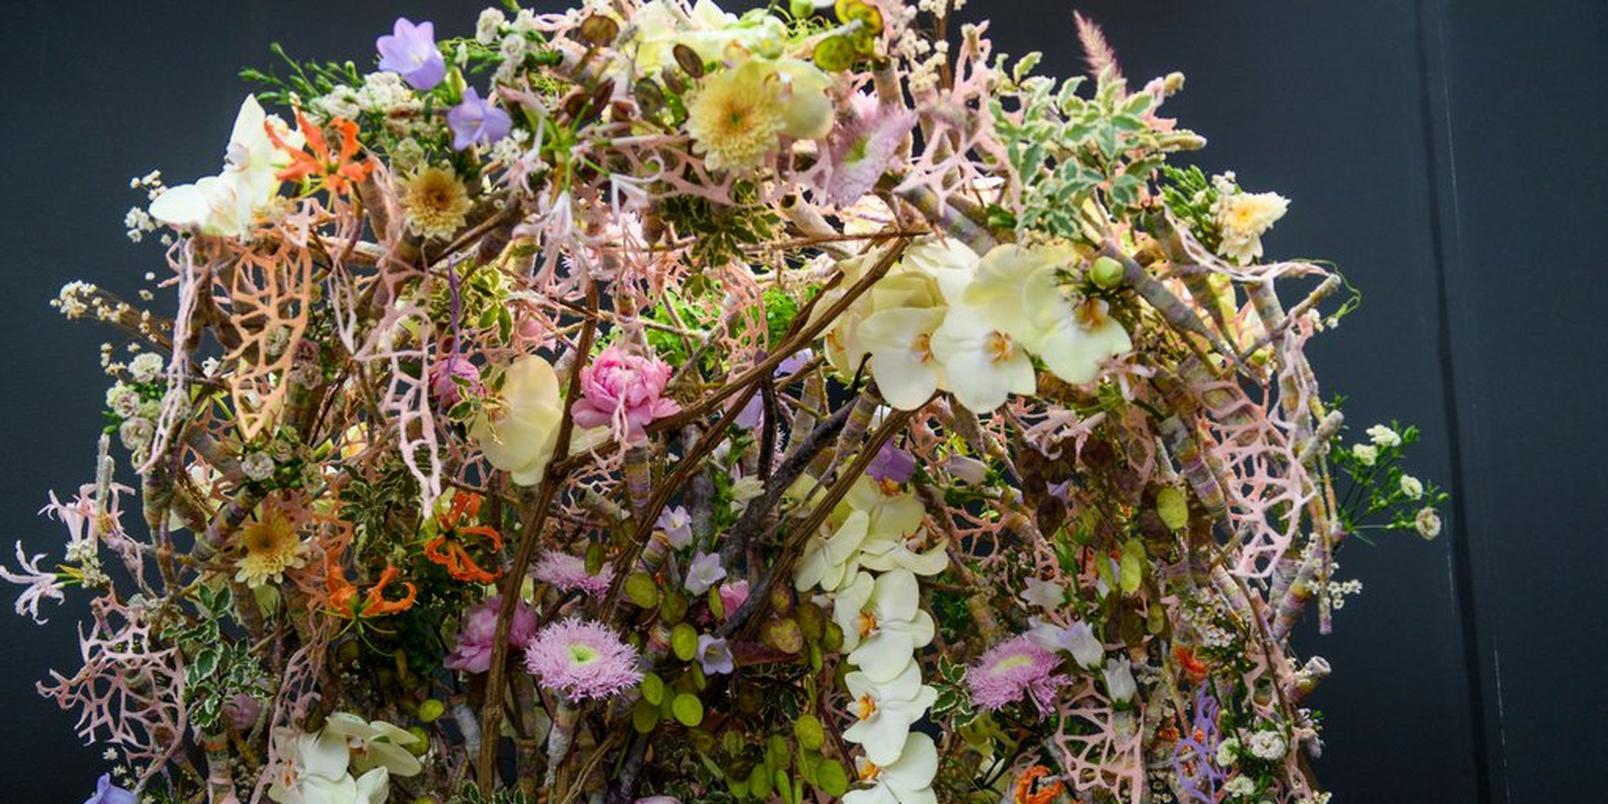 laura-leong-crowned-interflora-florist-year-2018-5